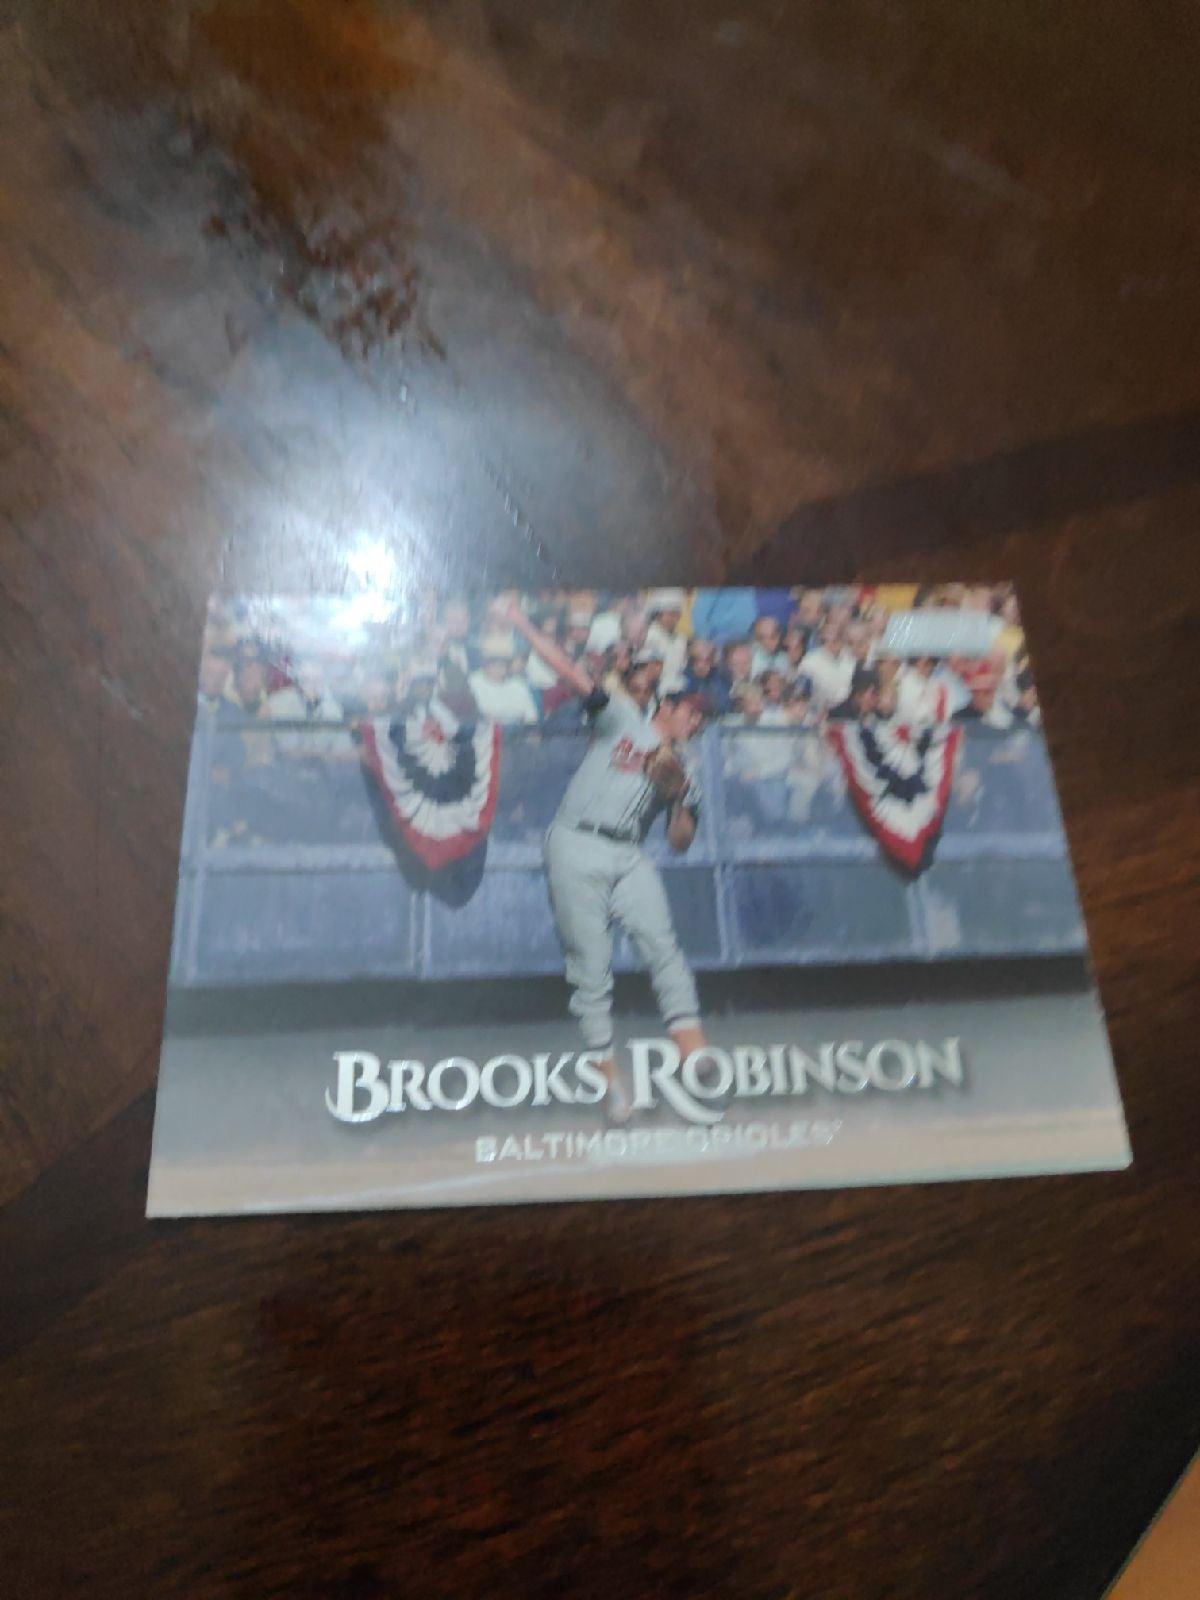 Brooks Robinson card